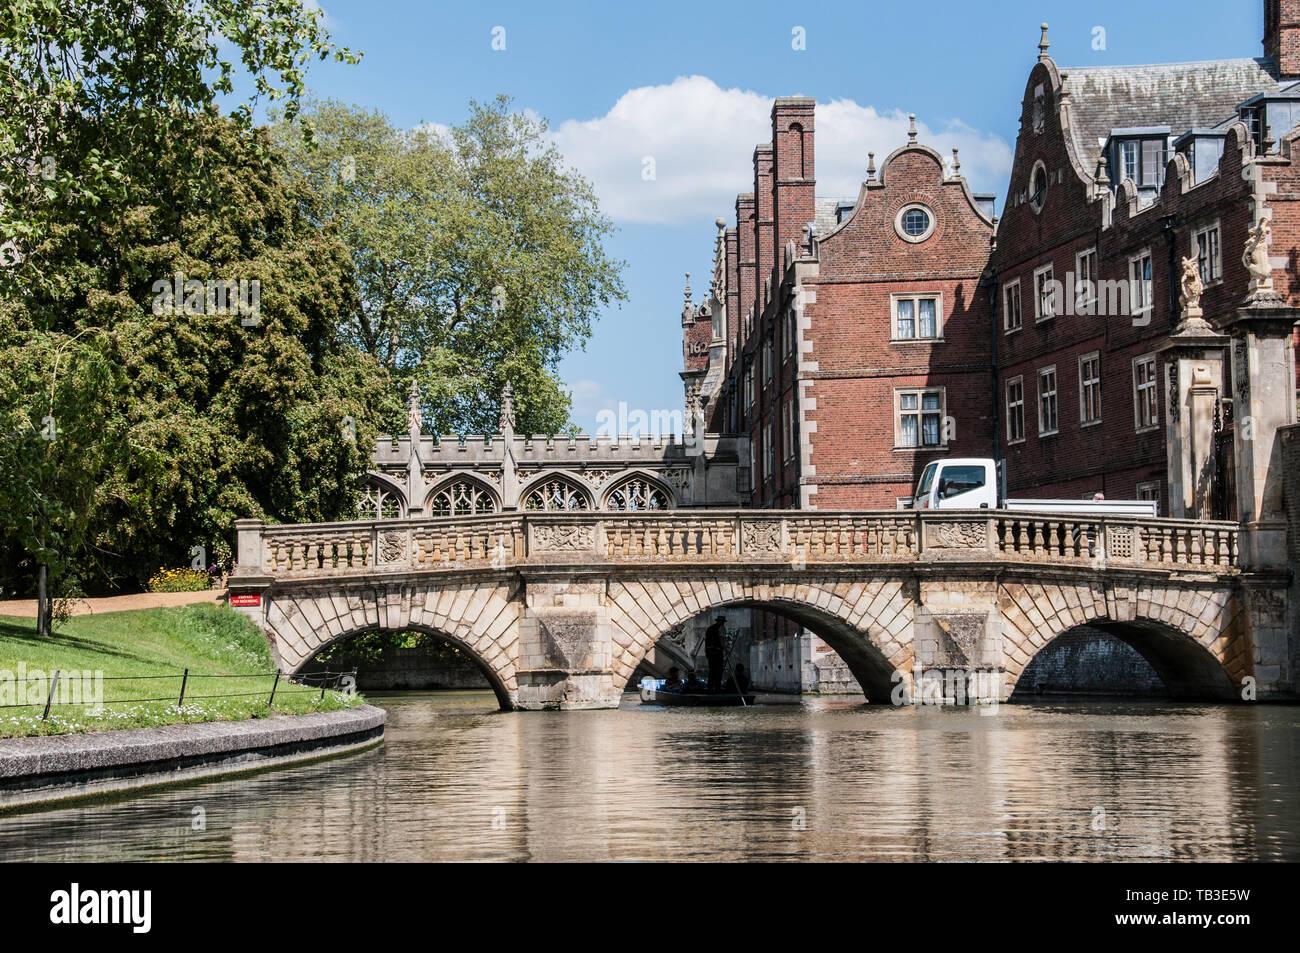 Kitchen Bridge, over the River Cam, Cambridge, UK - Stock Image